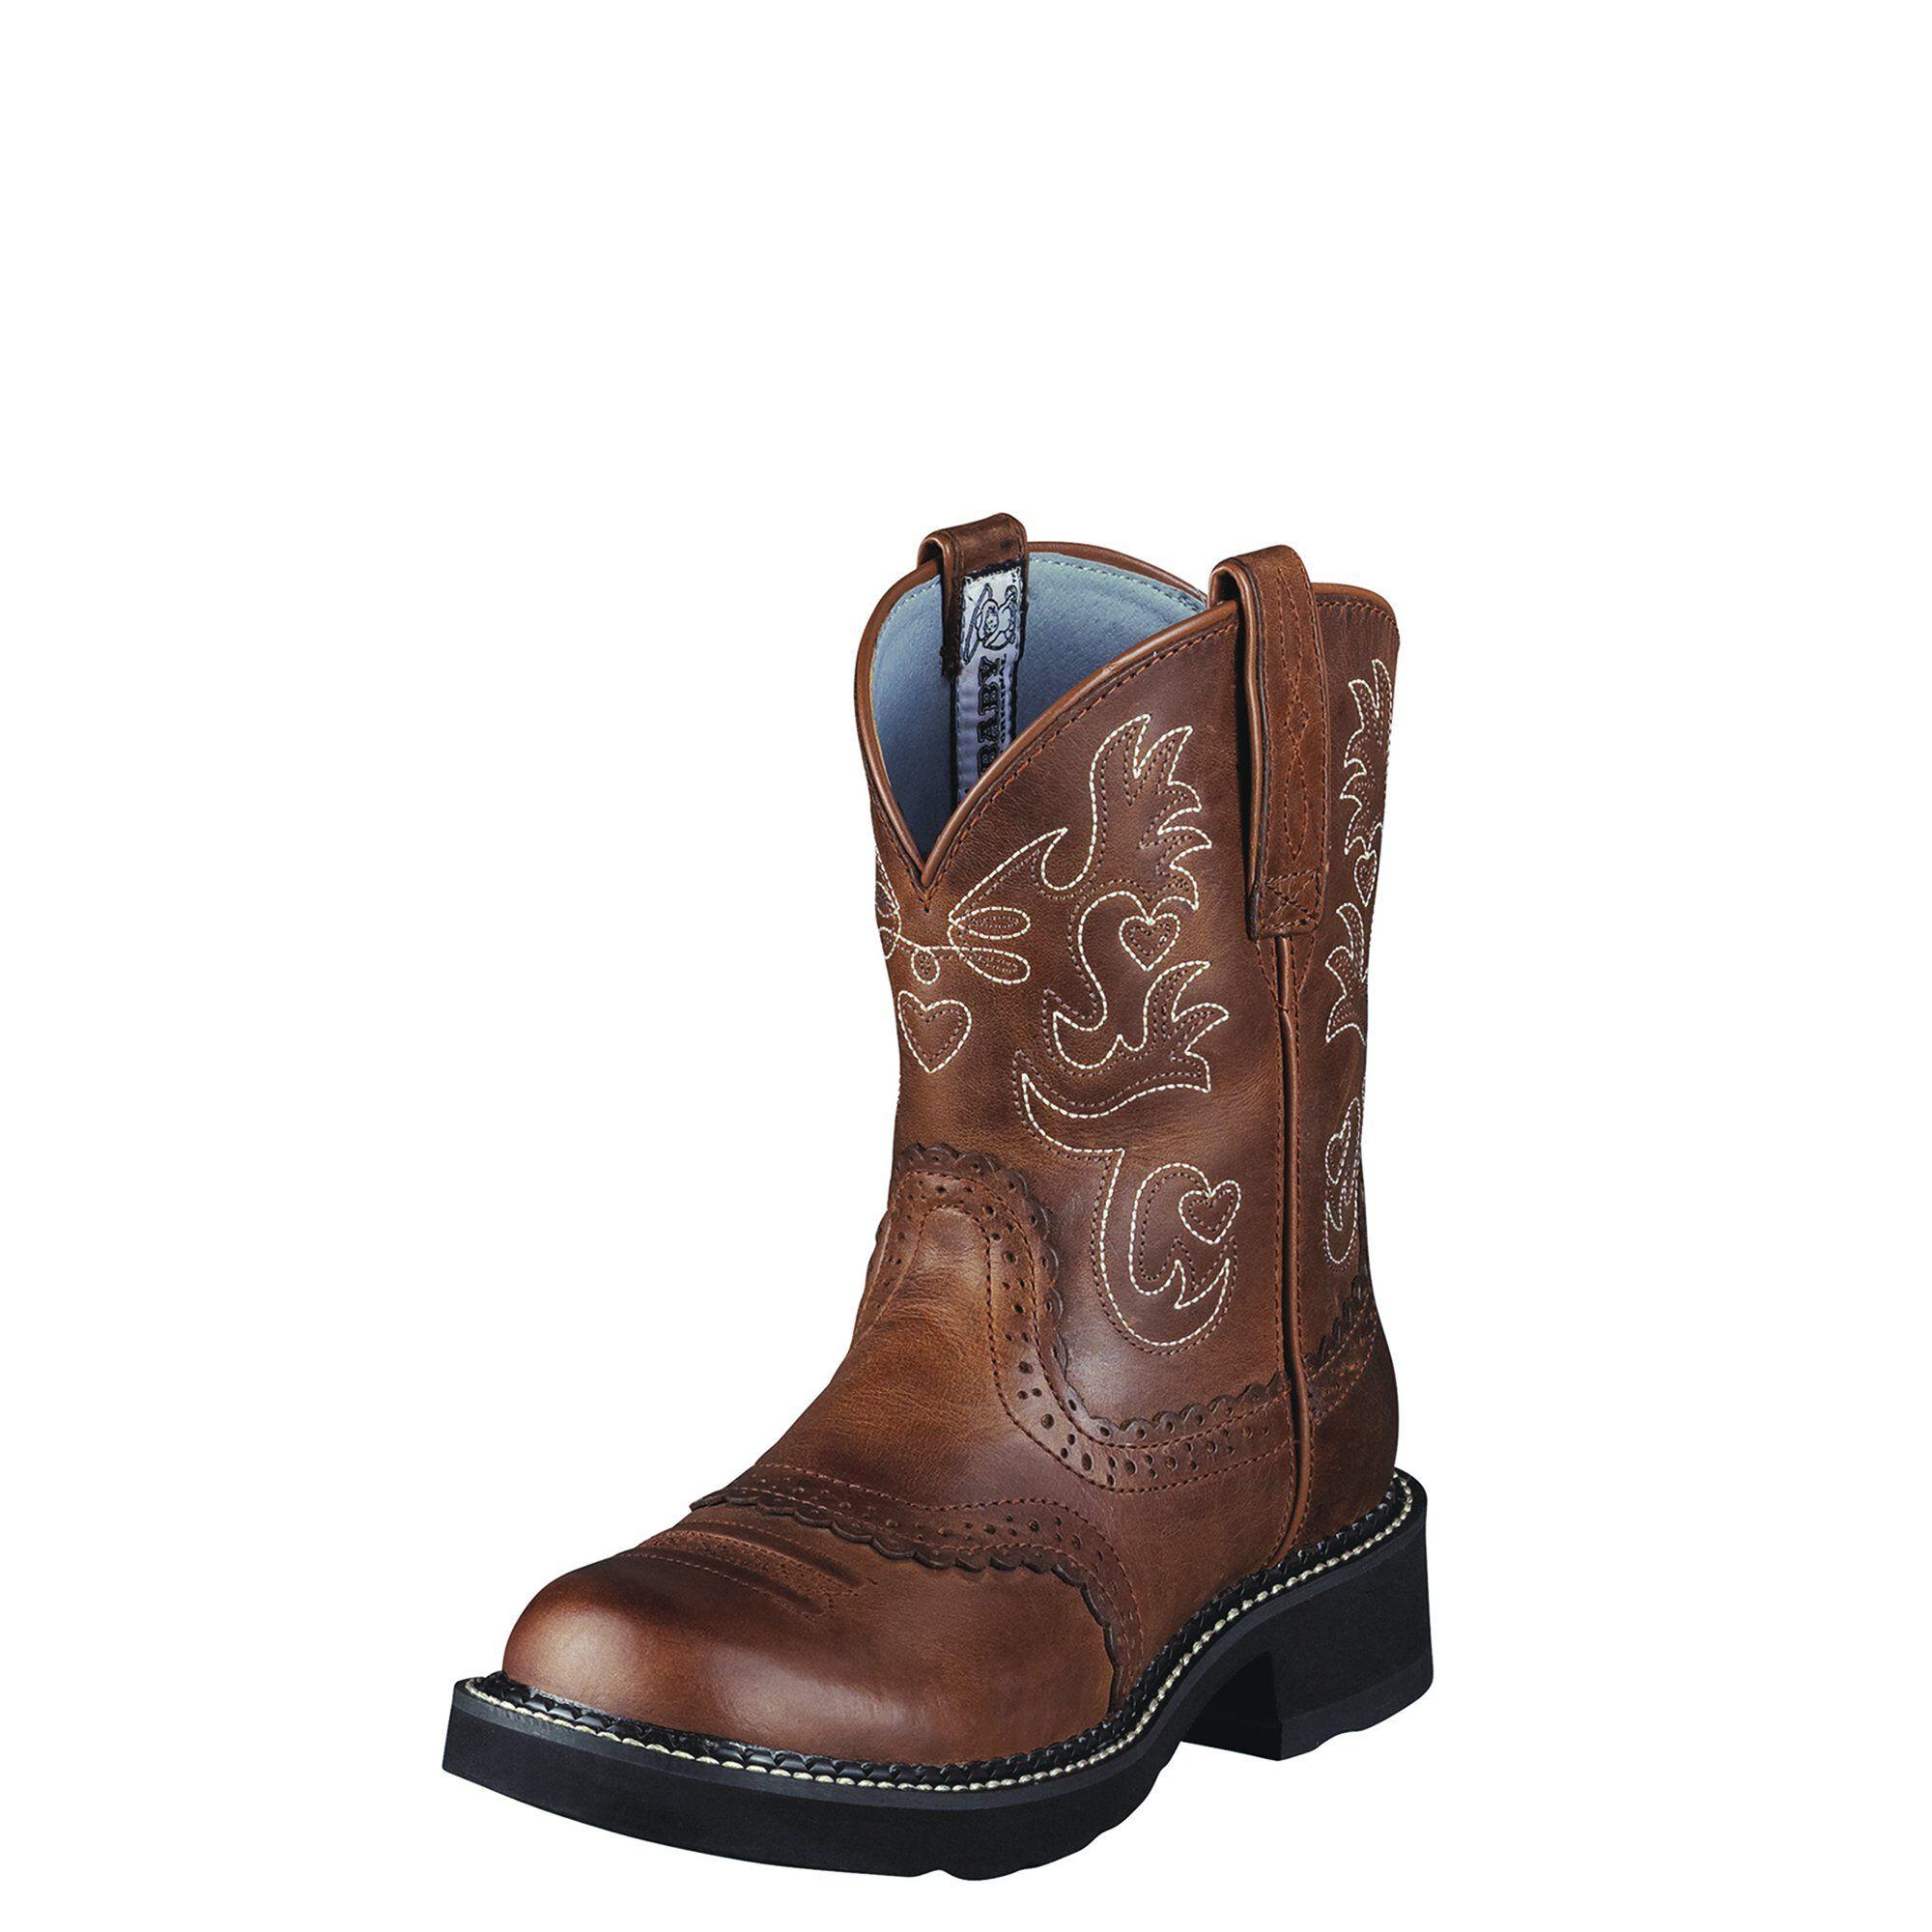 b9f314bca2e9b Fatbaby Saddle Western Boot